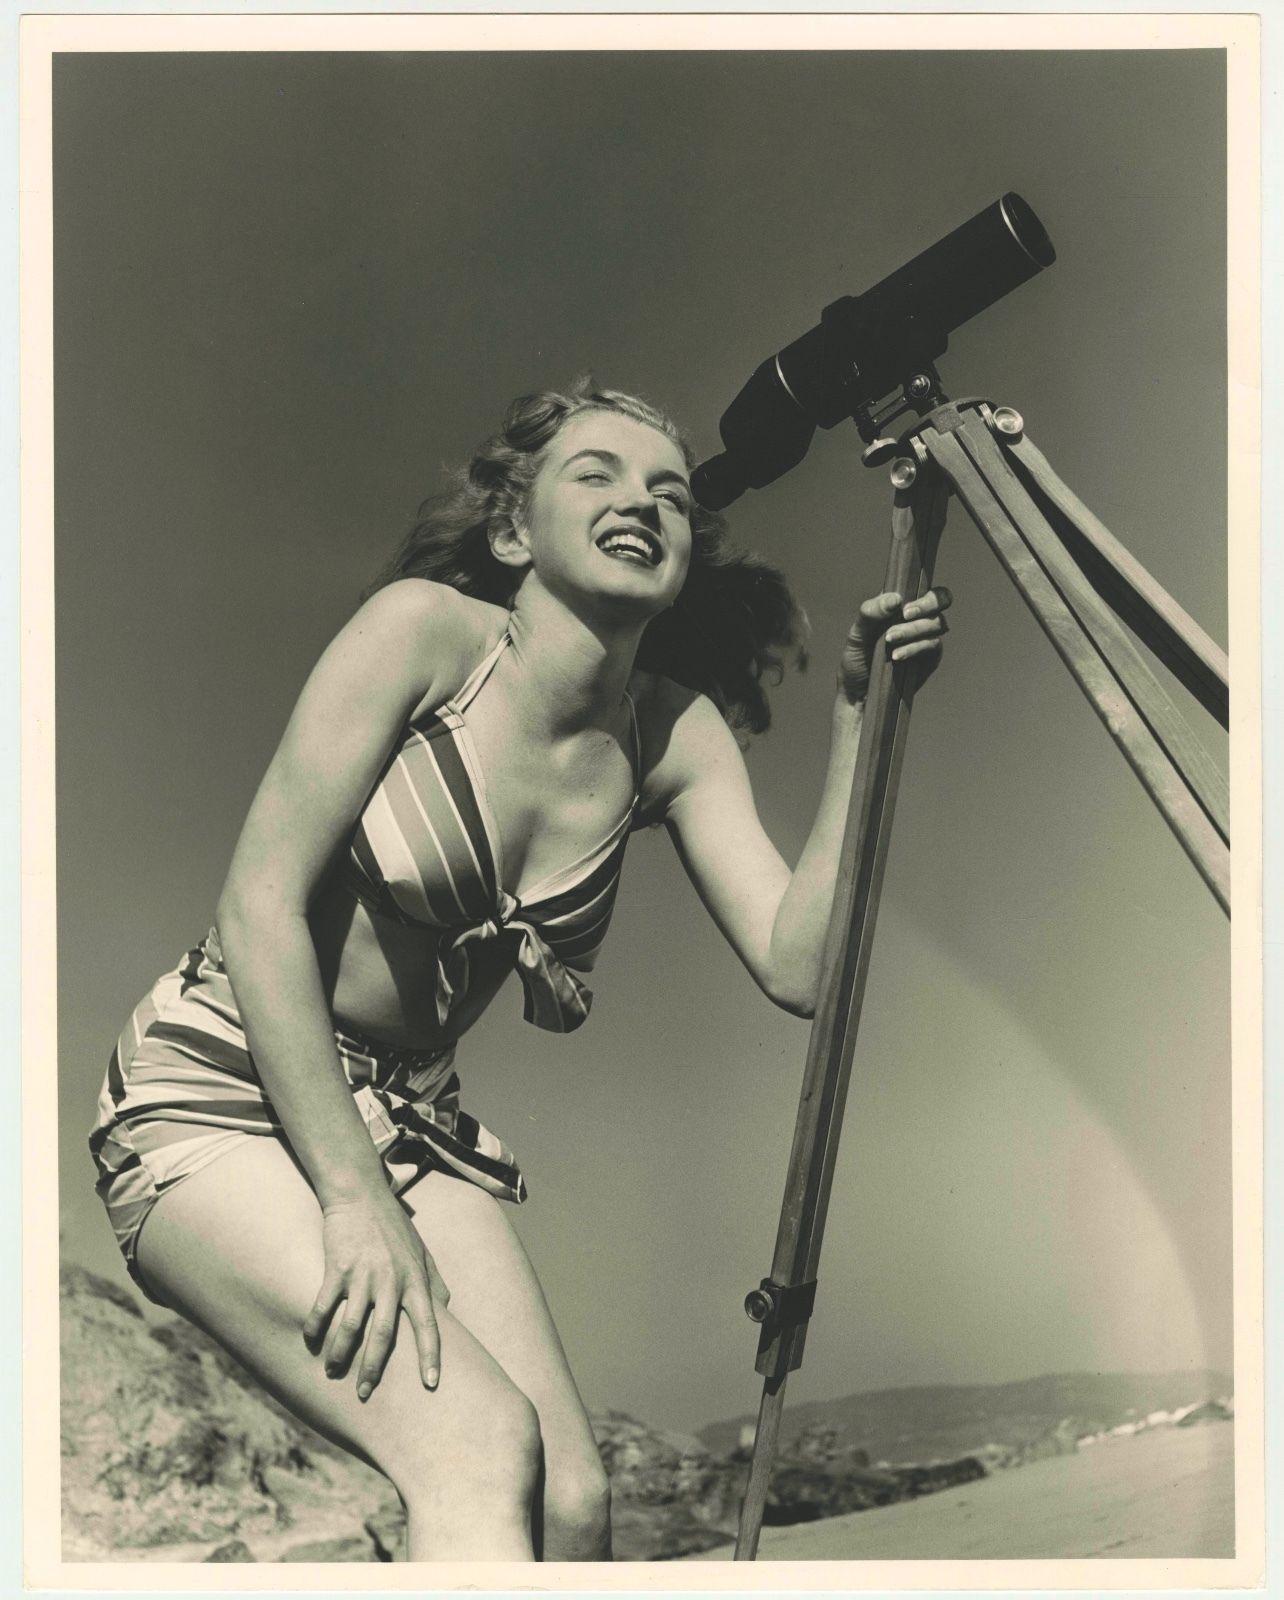 daeccb826315 1946 Marilyn Monroe Black White Photograph by Joseph Jasgur ...